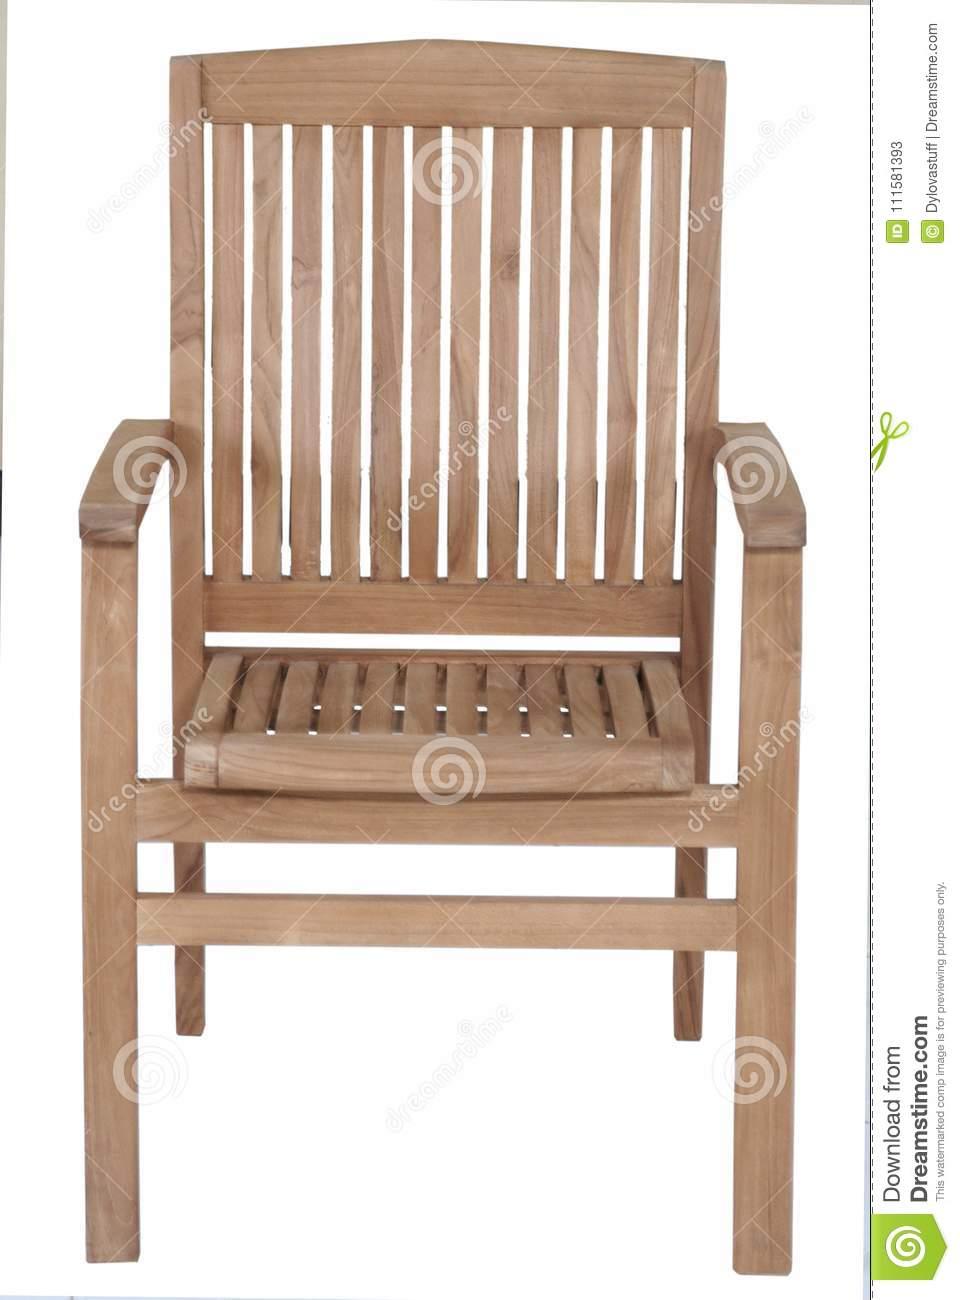 teakholzstuhl gartenmöbel garten möbel teakholz stuhl